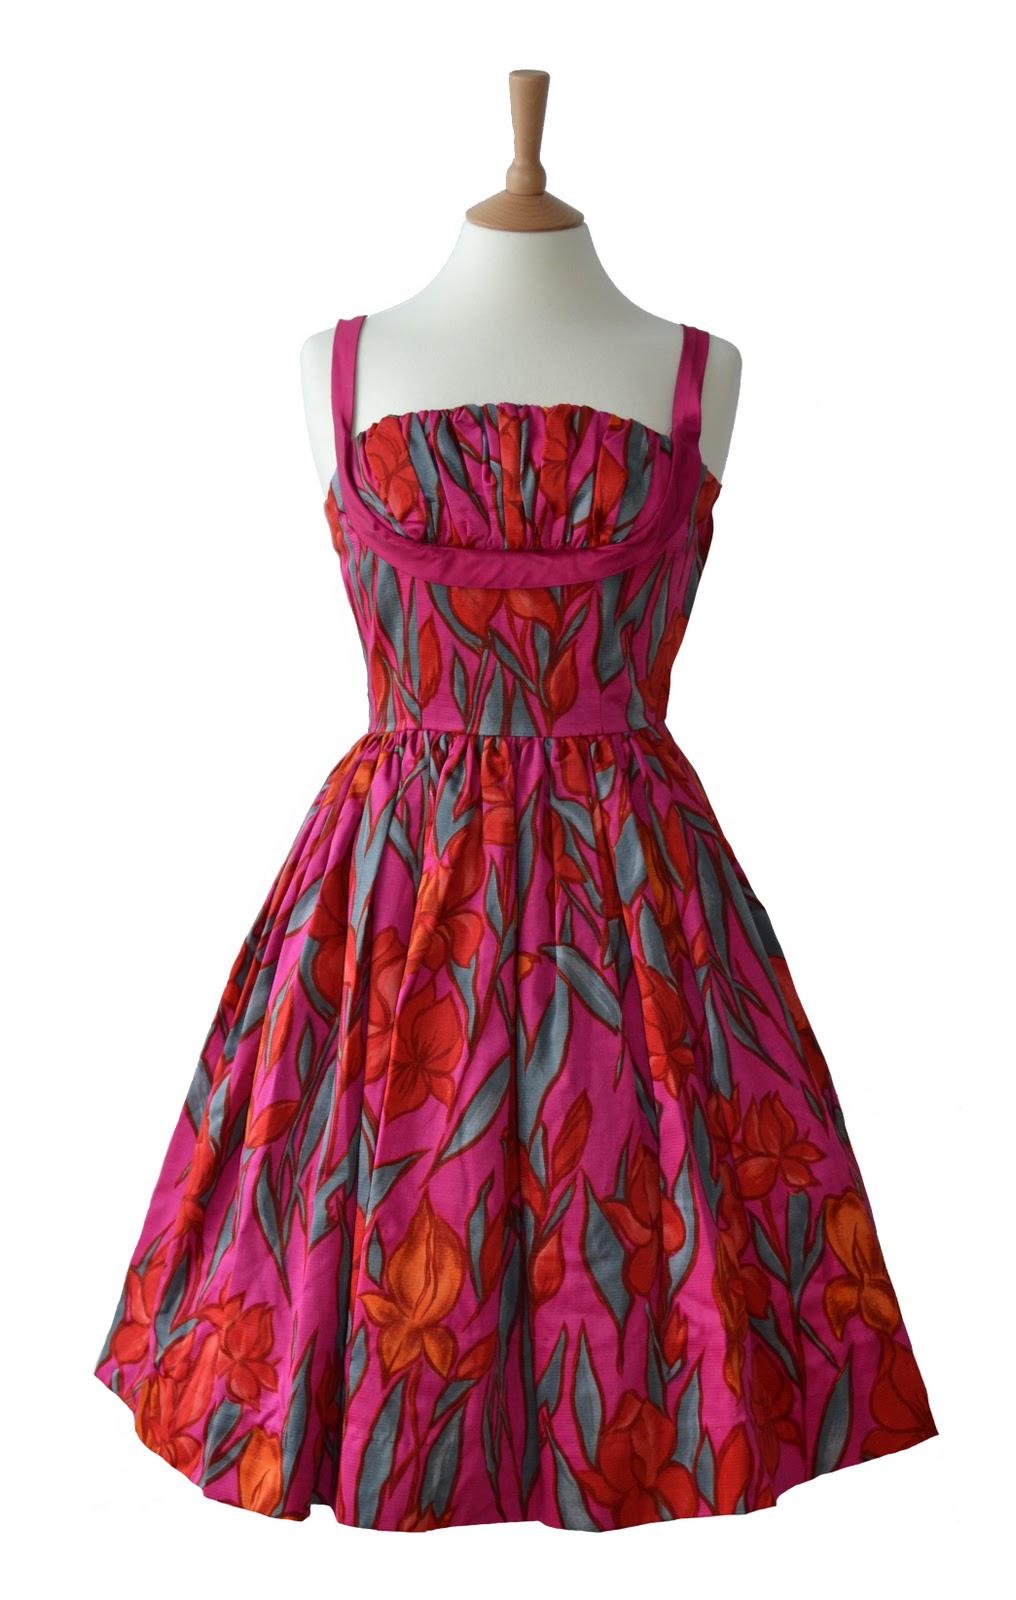 NEW 1950s Vintage Dresses!